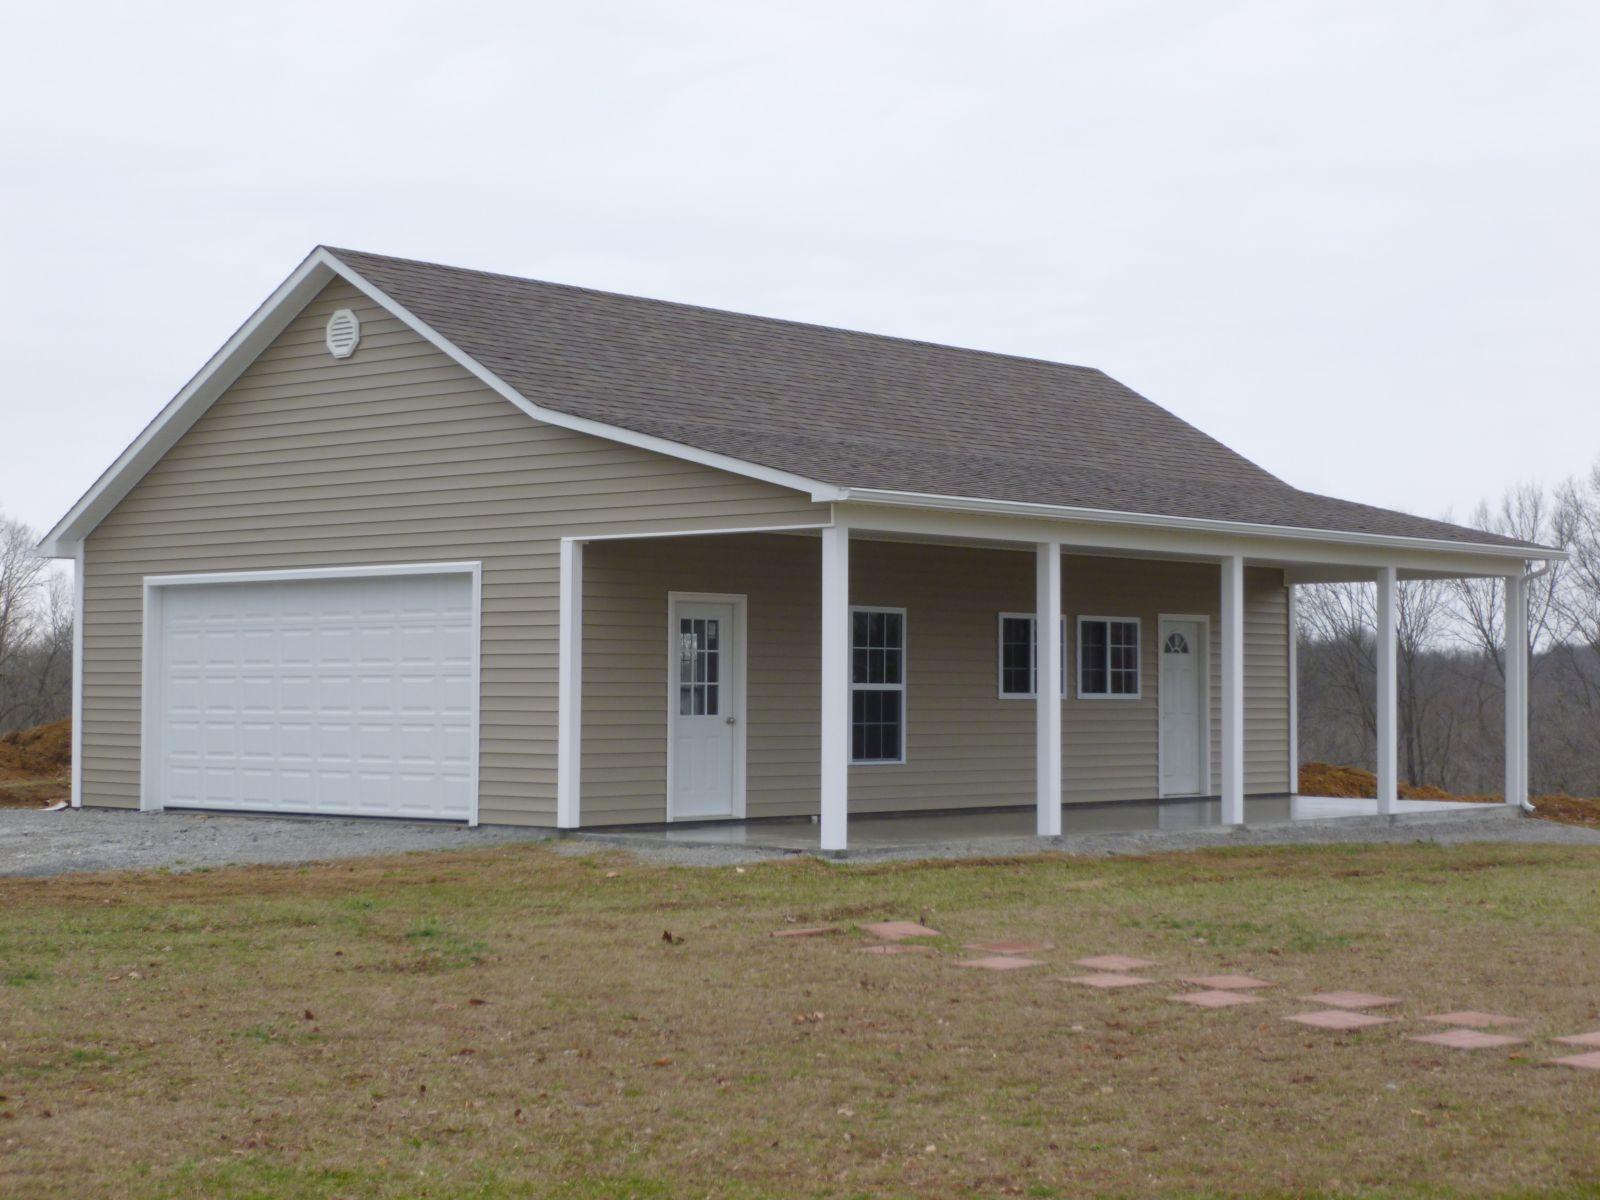 prebuilt garage built on site